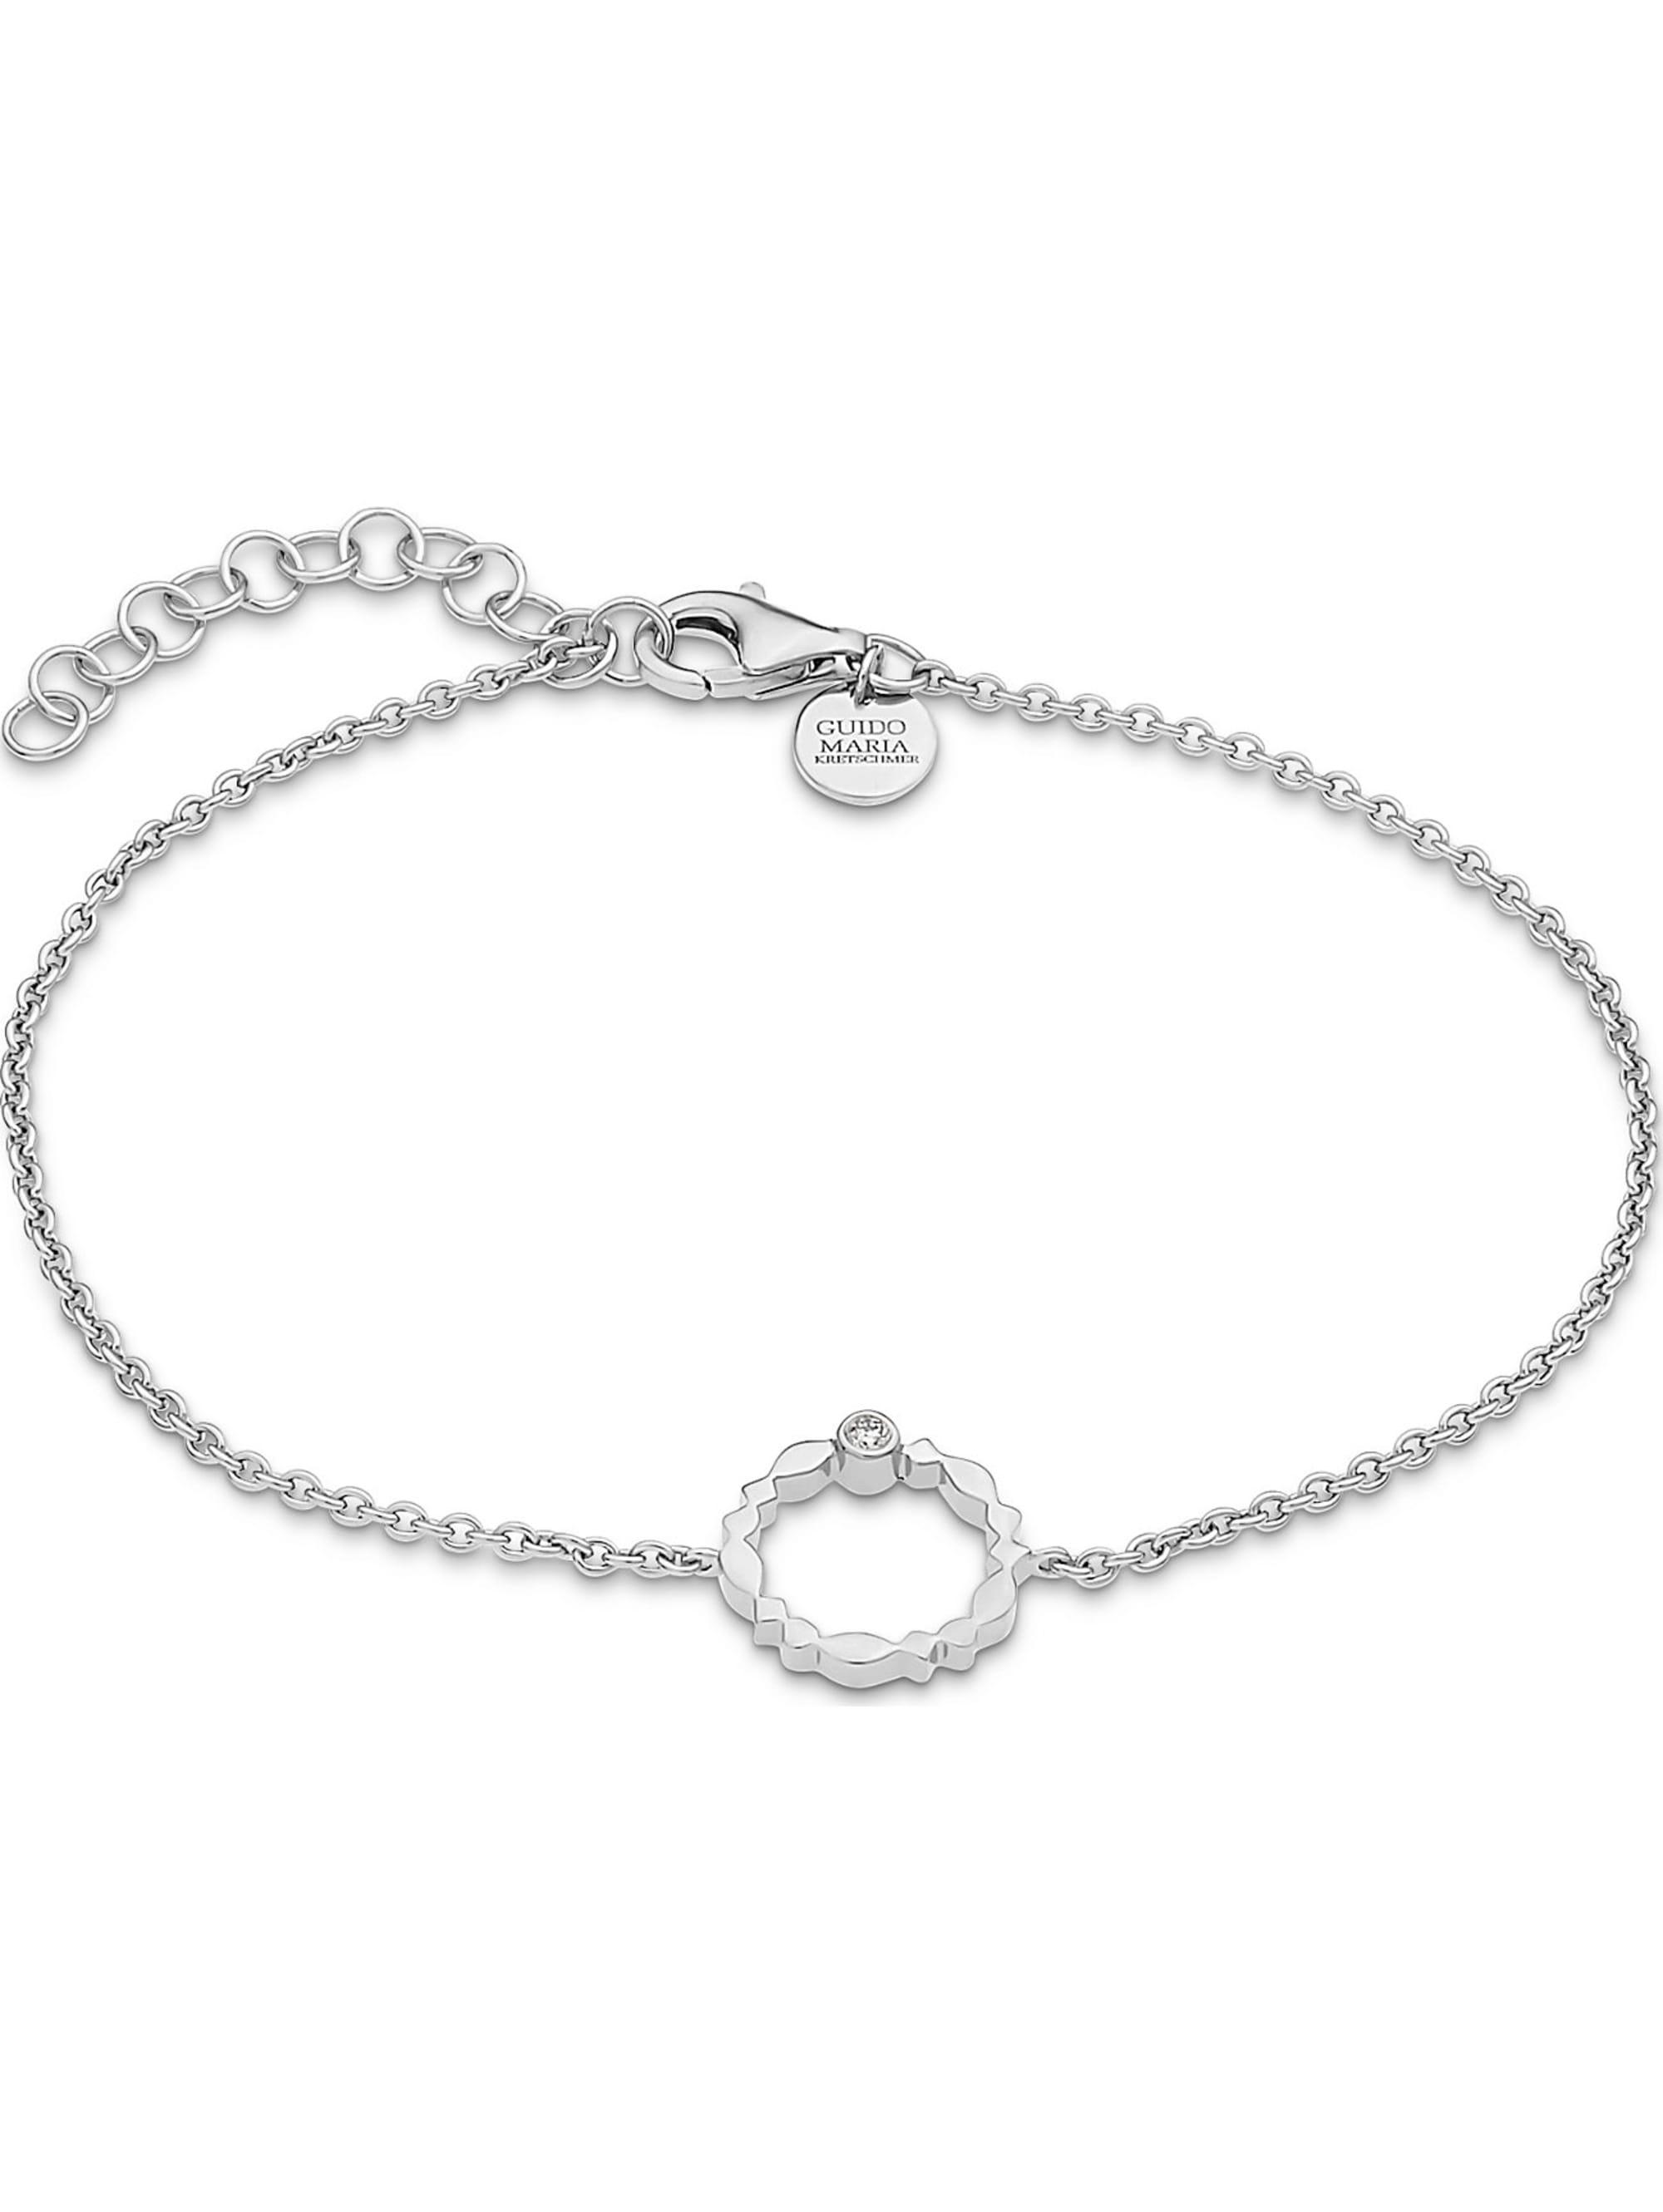 Guido Maria Kretschmer Guido Maria Kretschmer Damen-Armband 925er Silber 1 Diamant 2wCgu